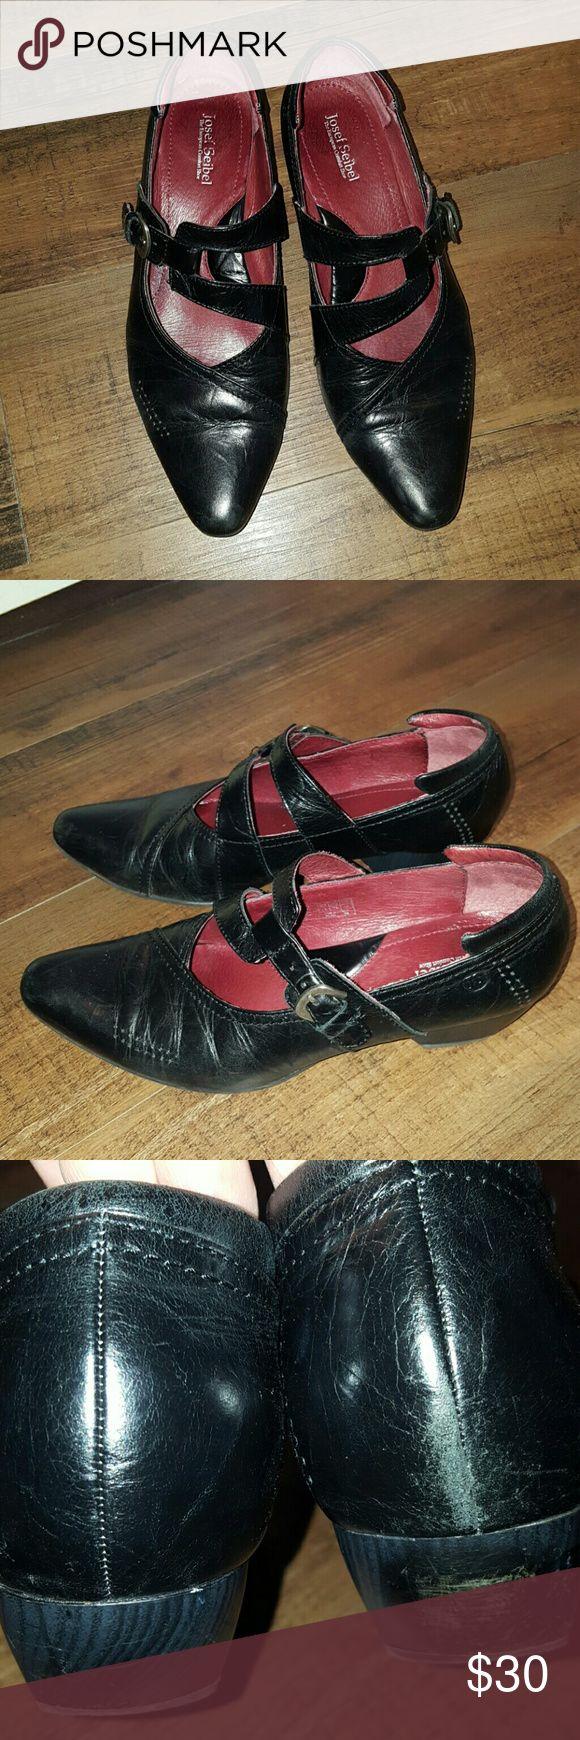 Josef seibel dress shoes Size 38 Josef Seibel black dress shoes. Pre-loved condition. Small heel very comfortable Josef Seibel Shoes Heels